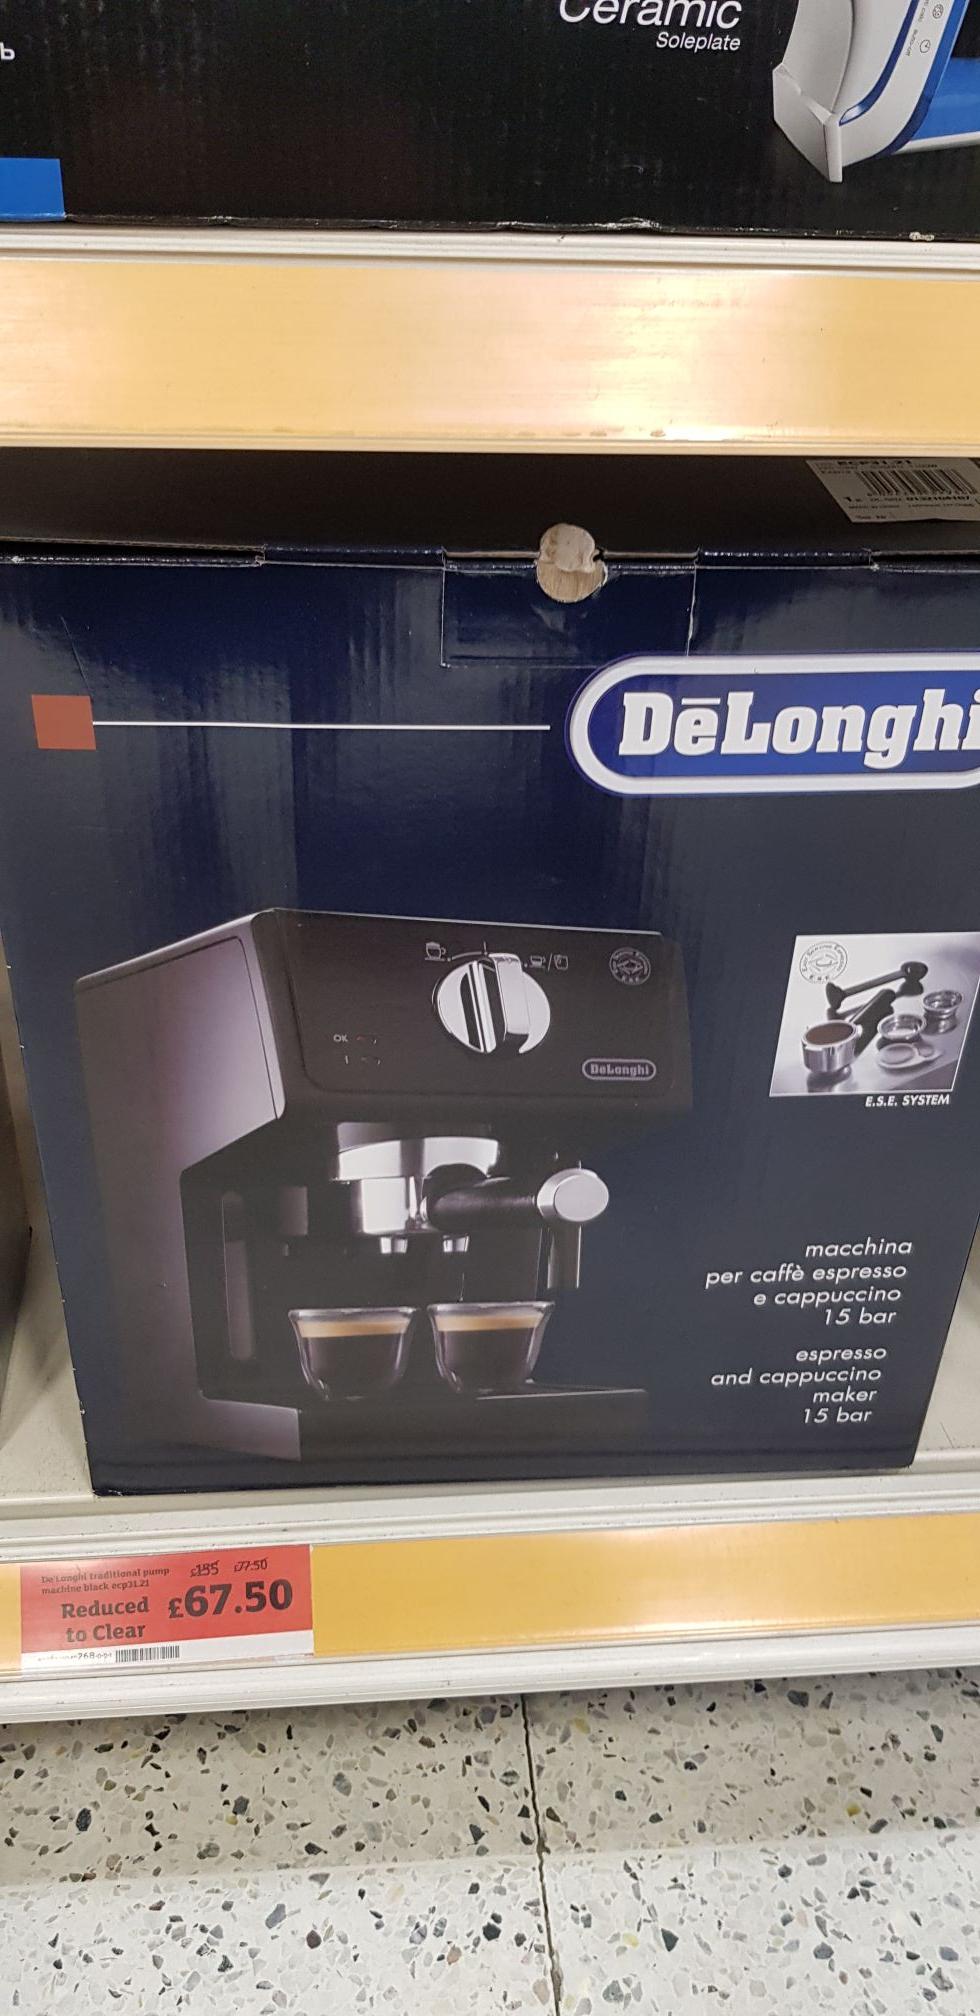 Delonghi Espresso machine ecp31. 21 £67.50 @ Sainsbury's instore